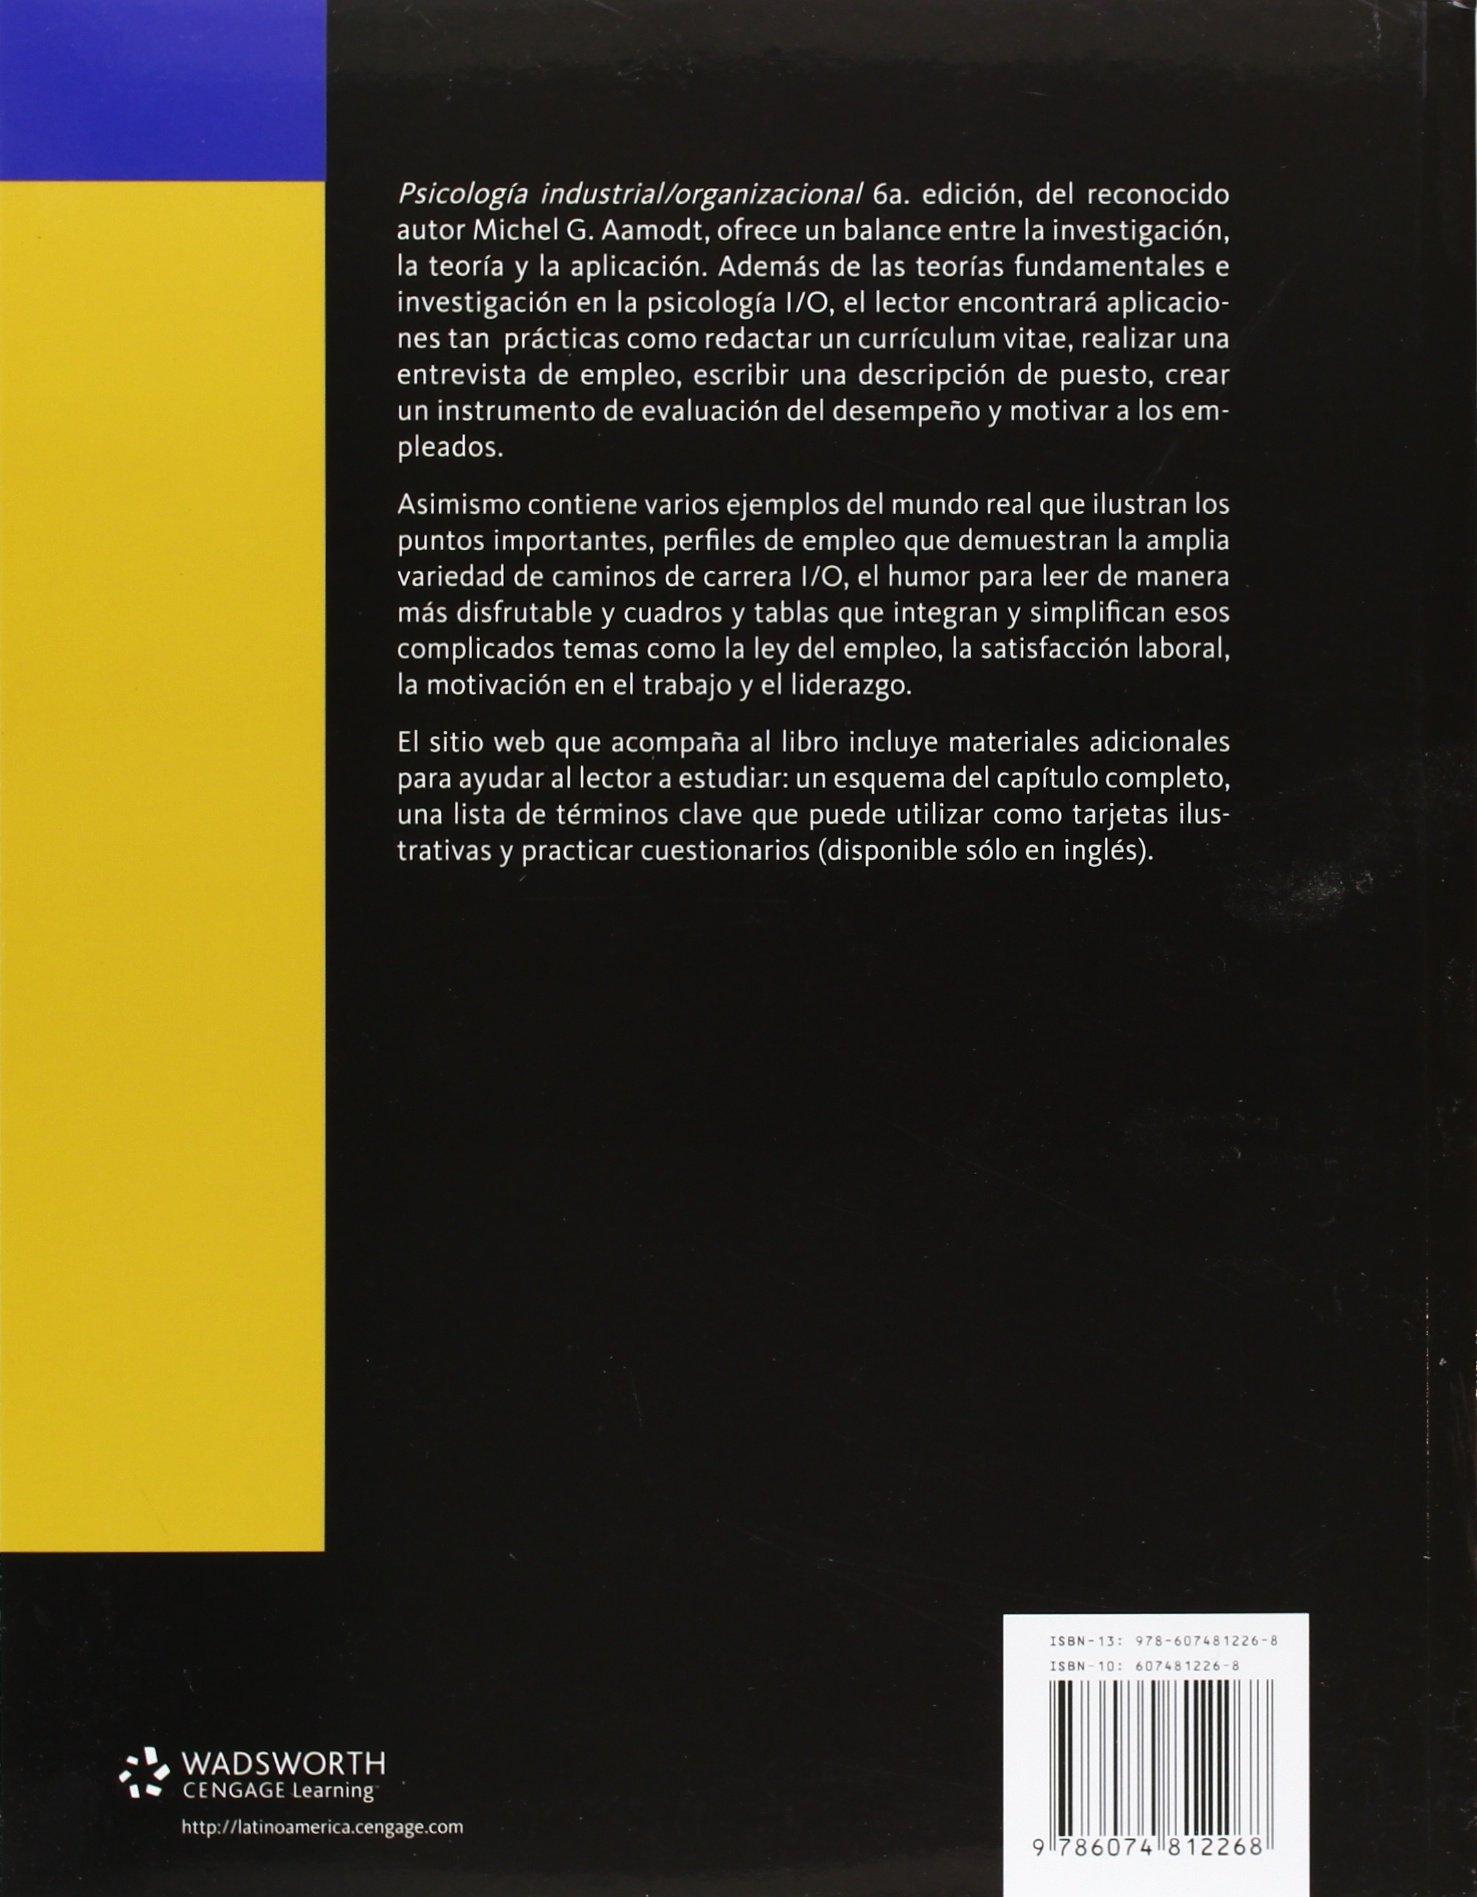 Psicologia Industrial/Organizacional: Aamodt: 9786074812268 ...